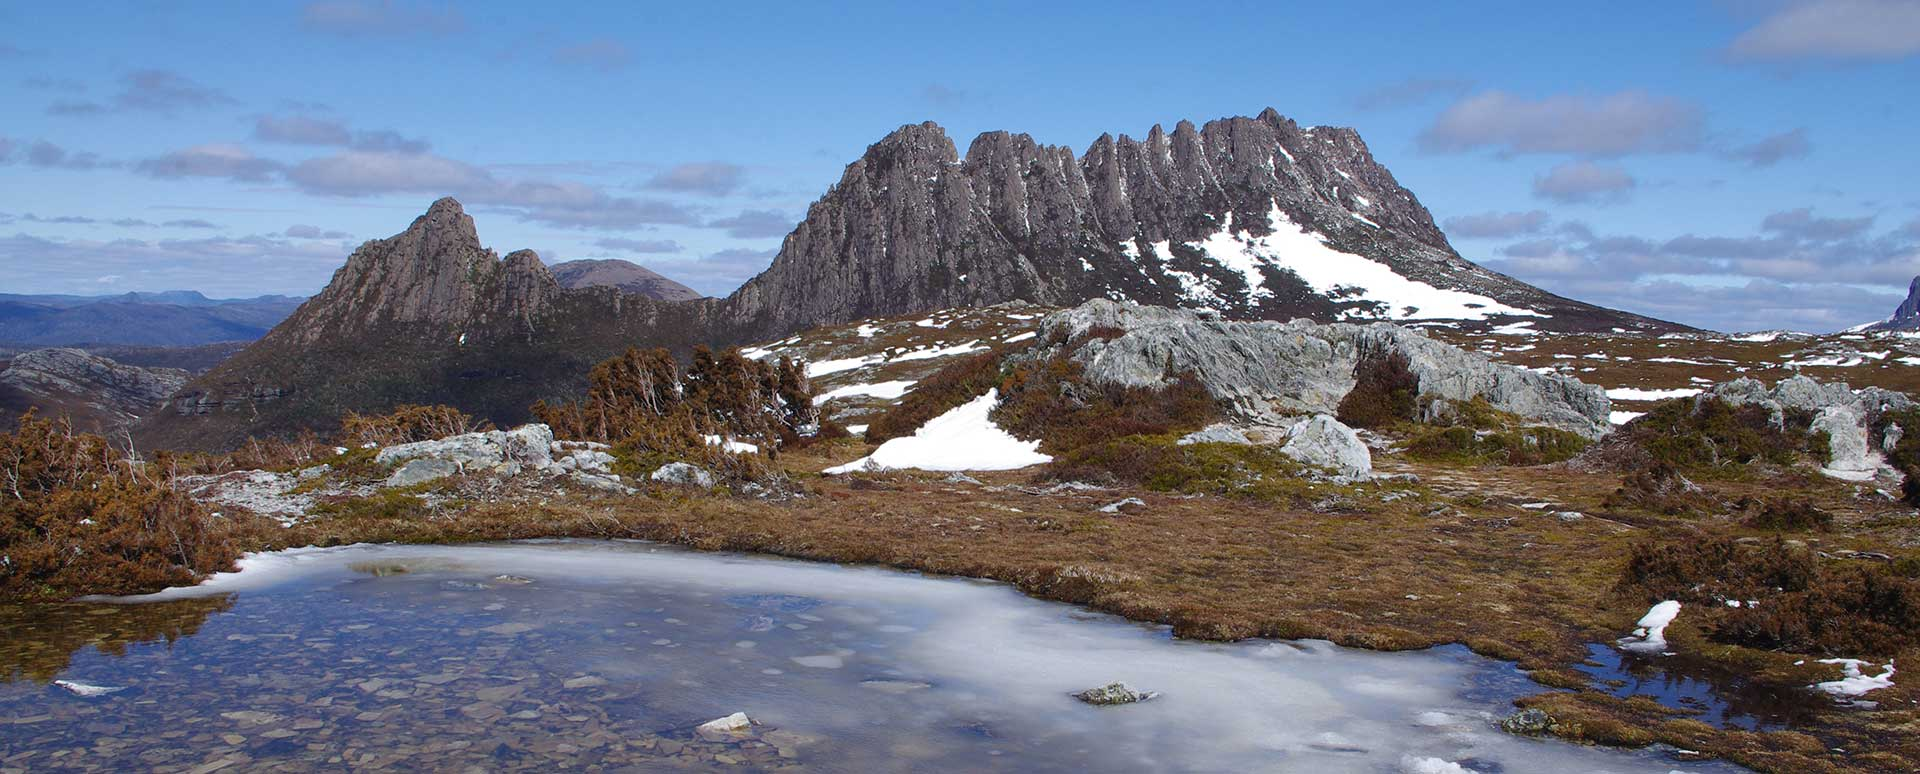 TAS_Cradle-Mountain